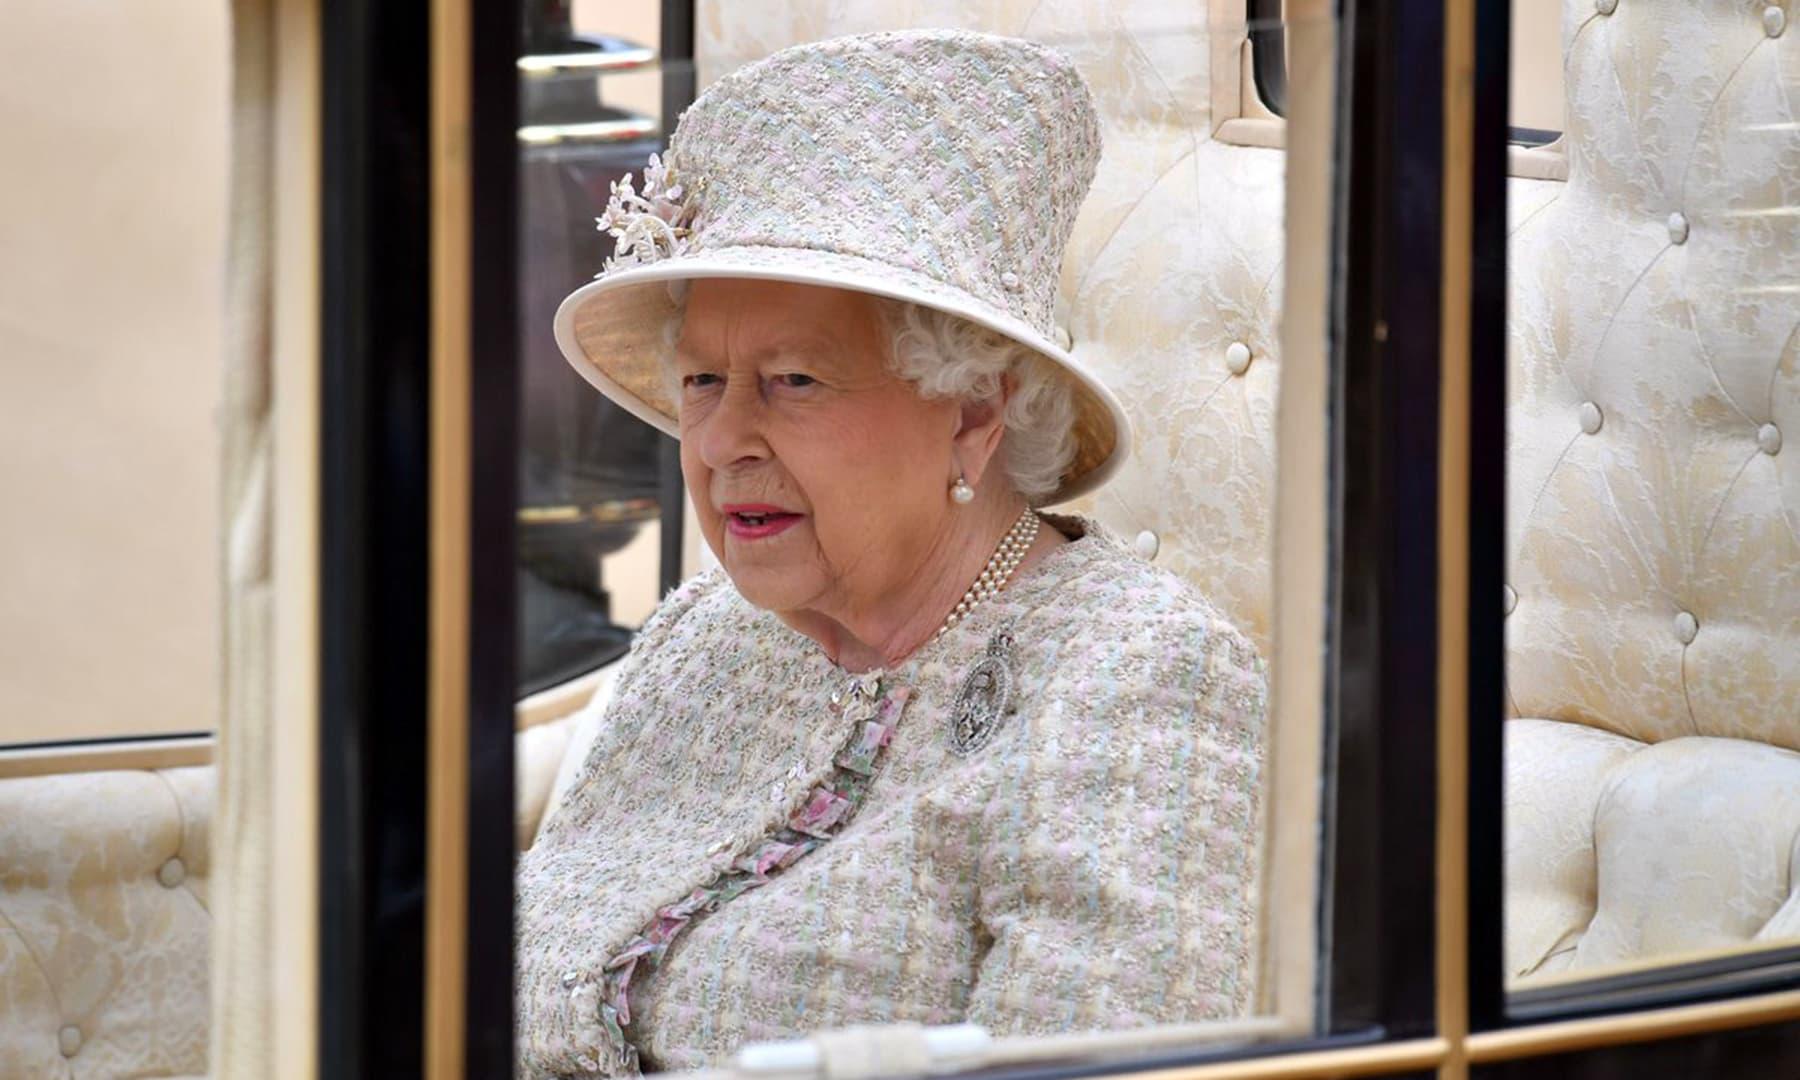 The Queen headed back to Buckingham Palace. — Photo courtesy @RoyalFamily